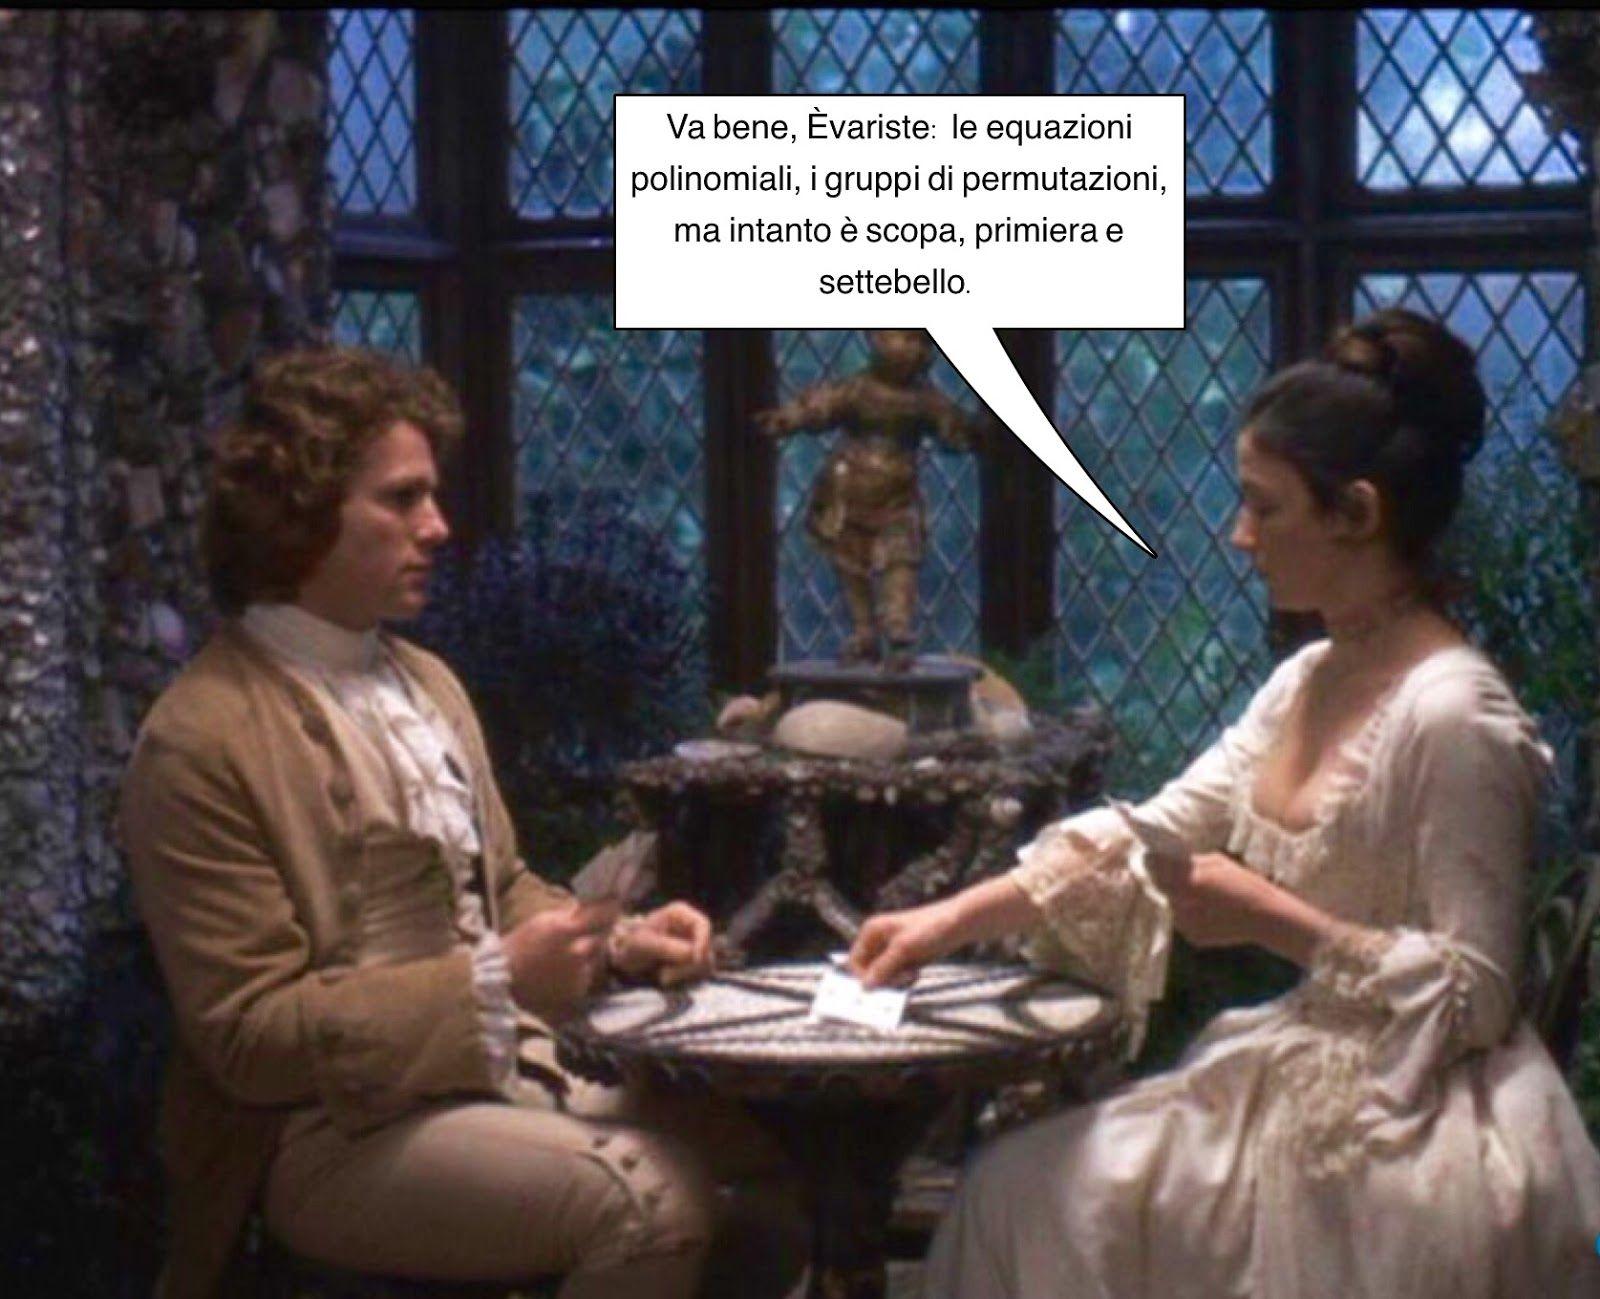 Galois #mattamatica. Knowing that Evariste Galois was